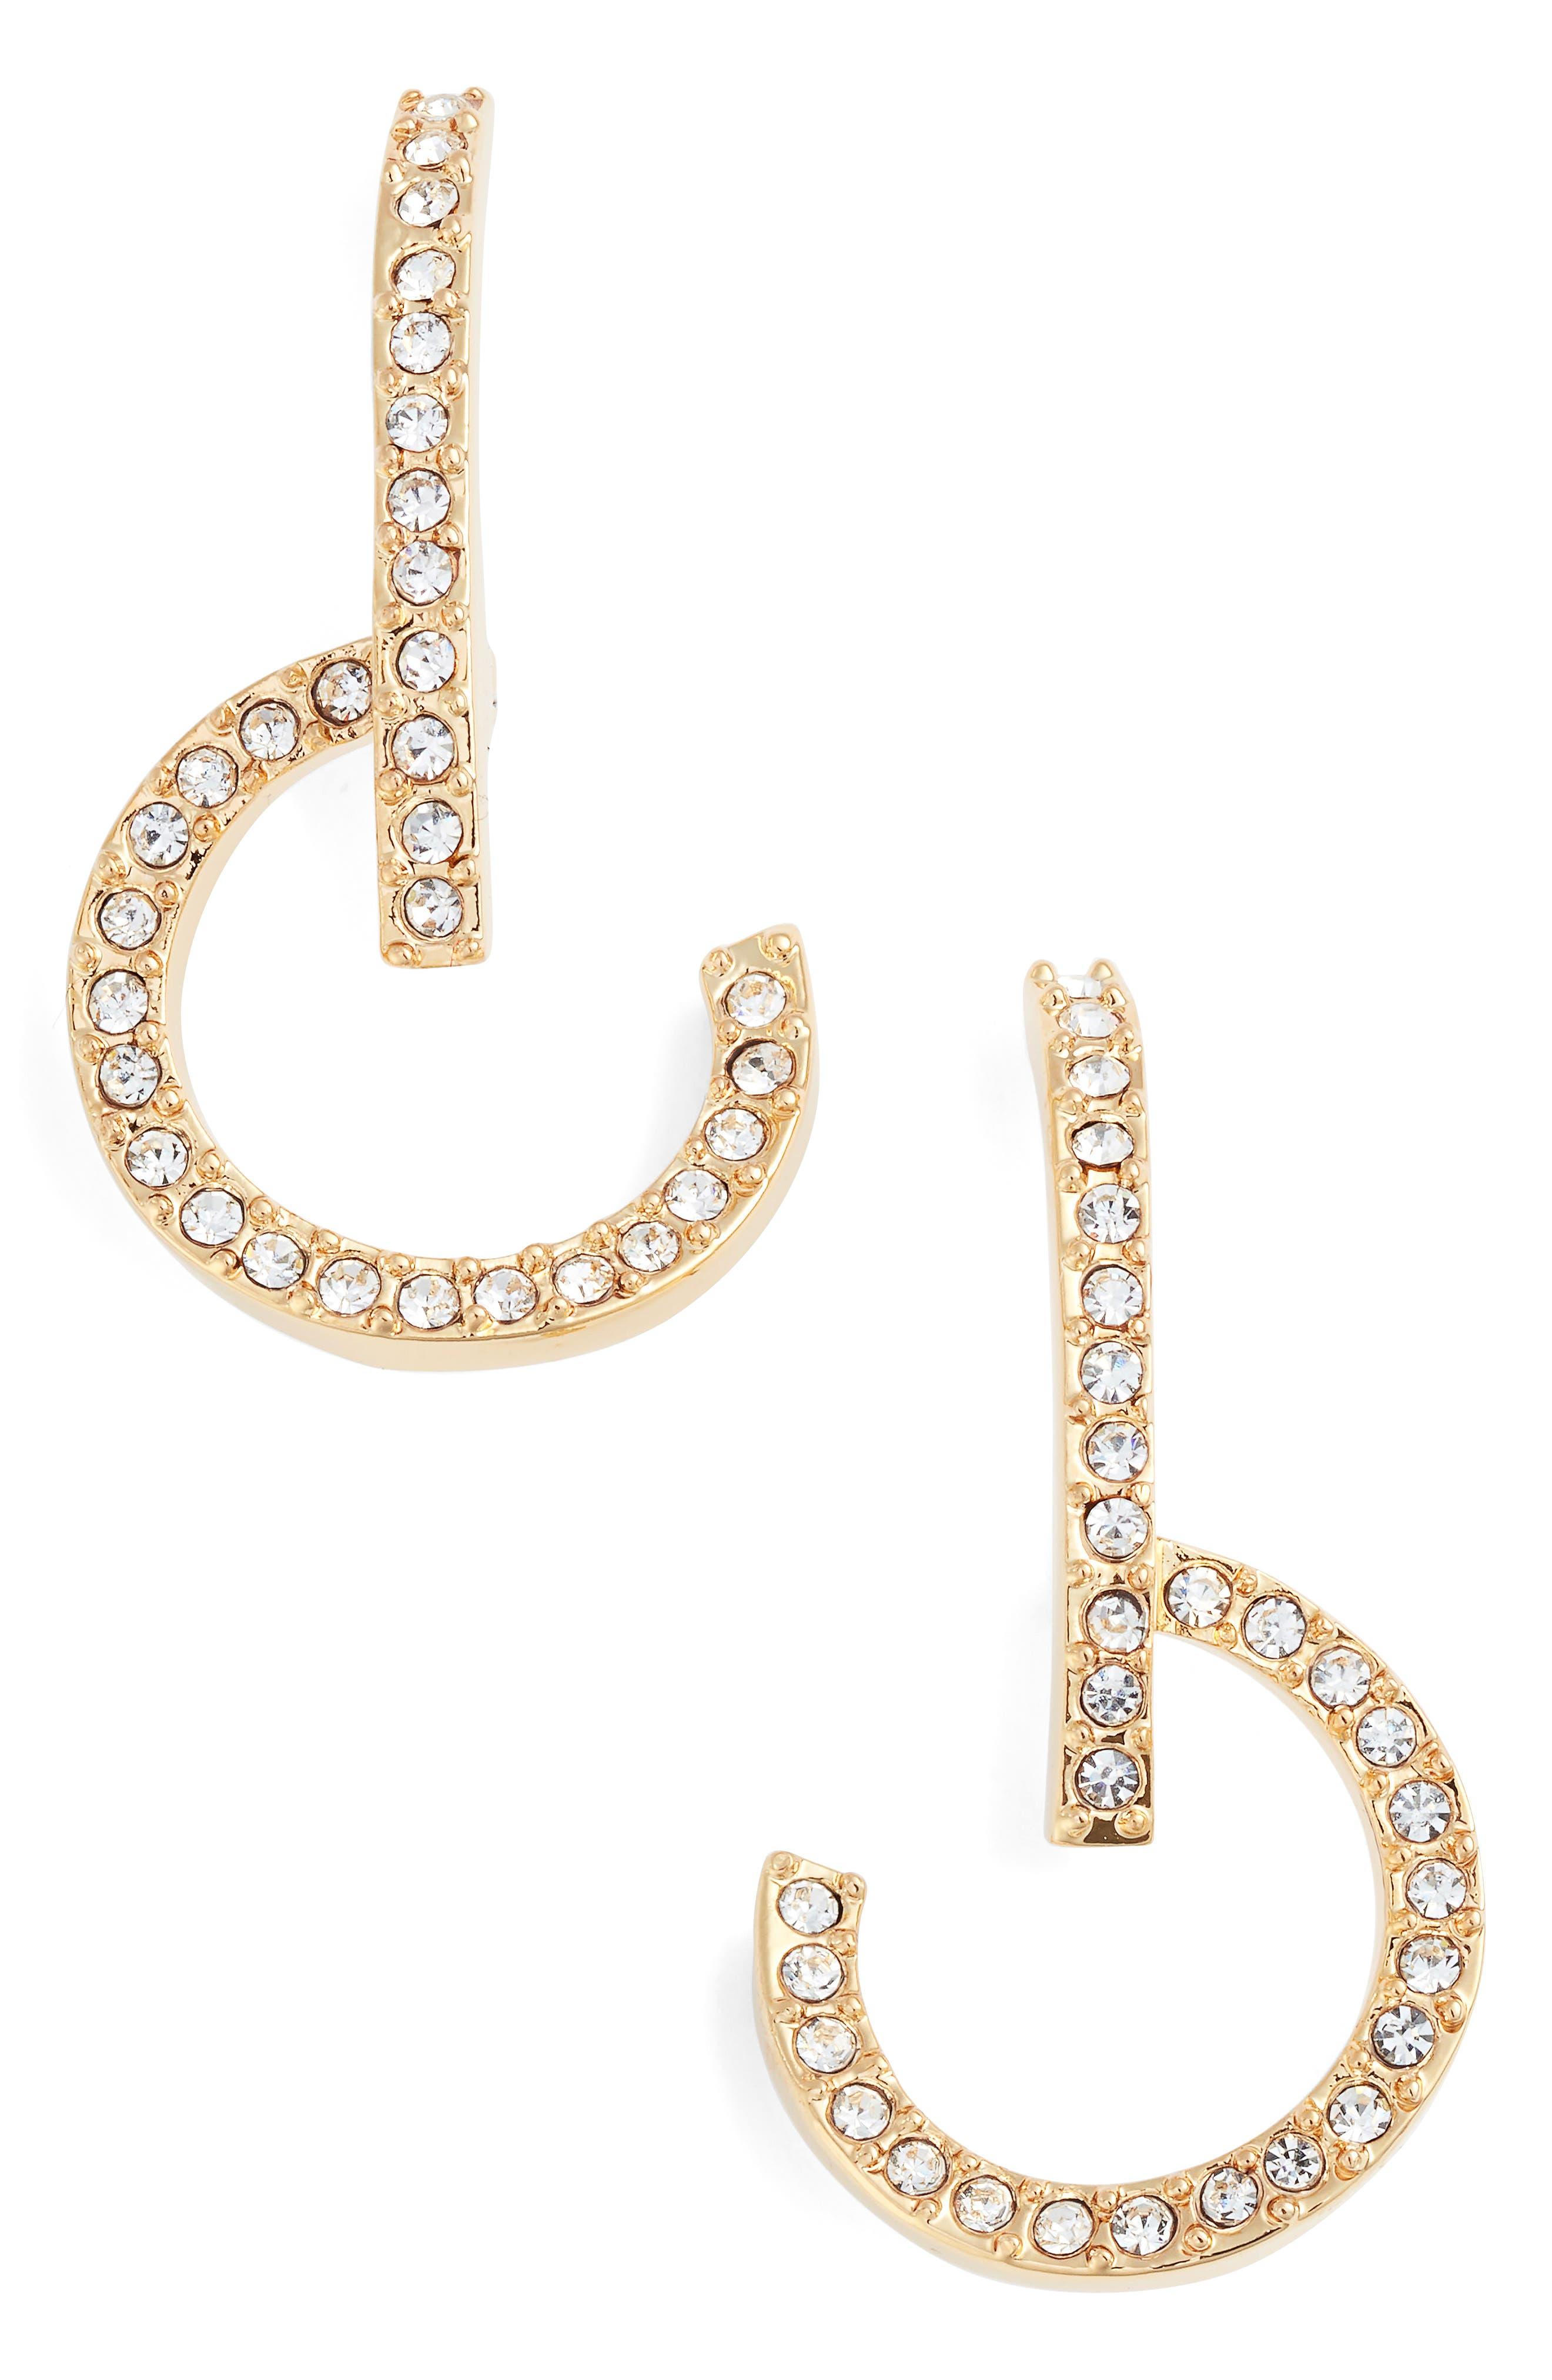 Lobe and Hoop Earrings,                         Main,                         color, GOLD